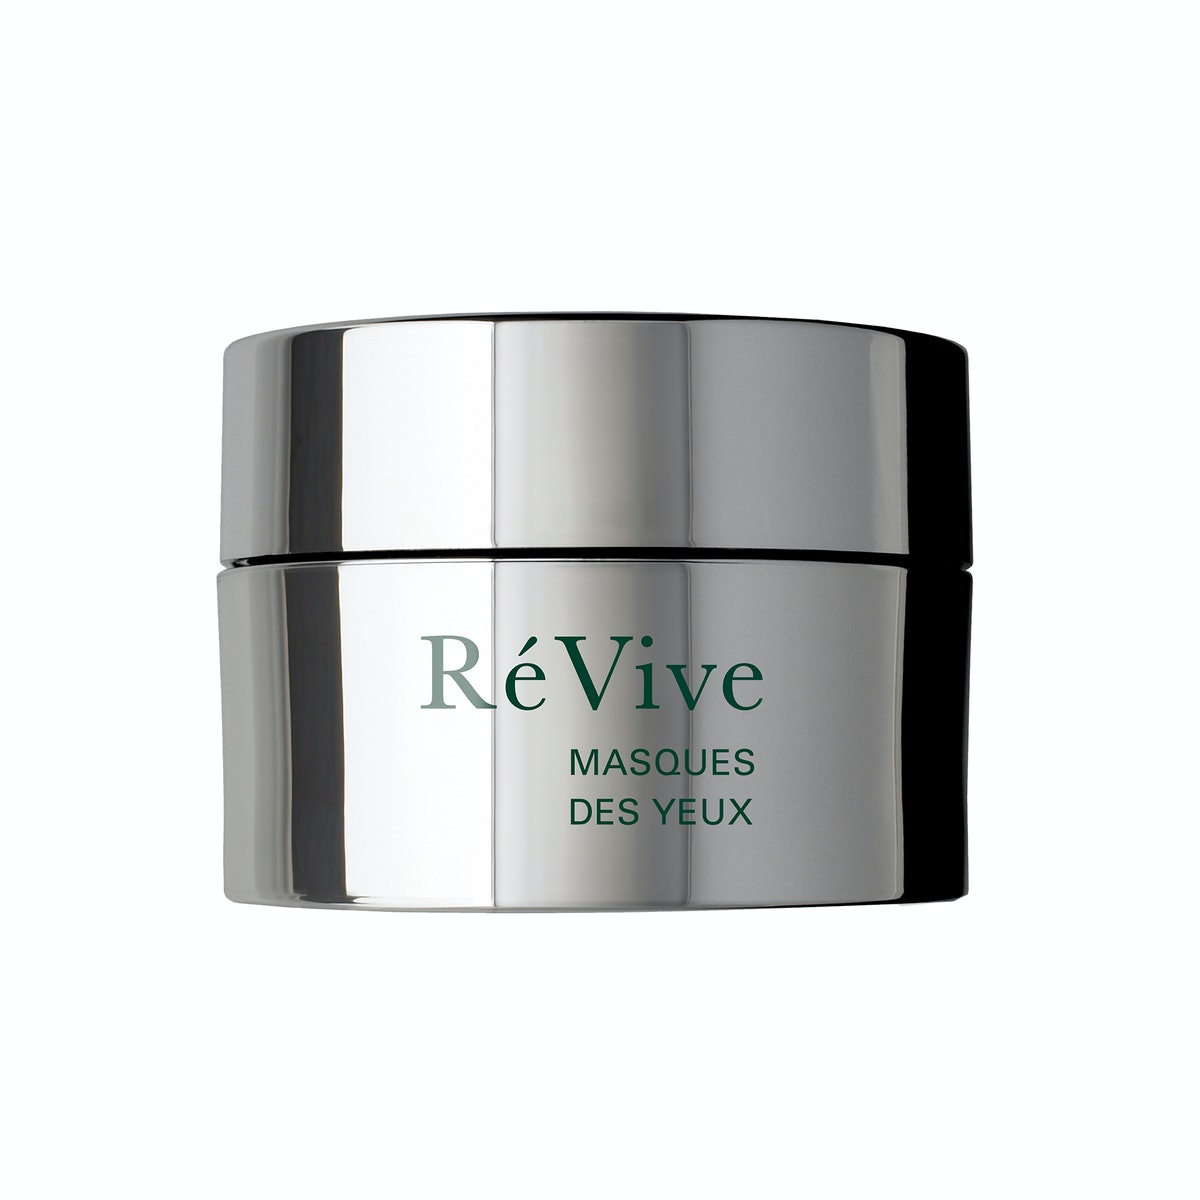 RéVive Masque Des Yeux Revitalizing Eye Mask